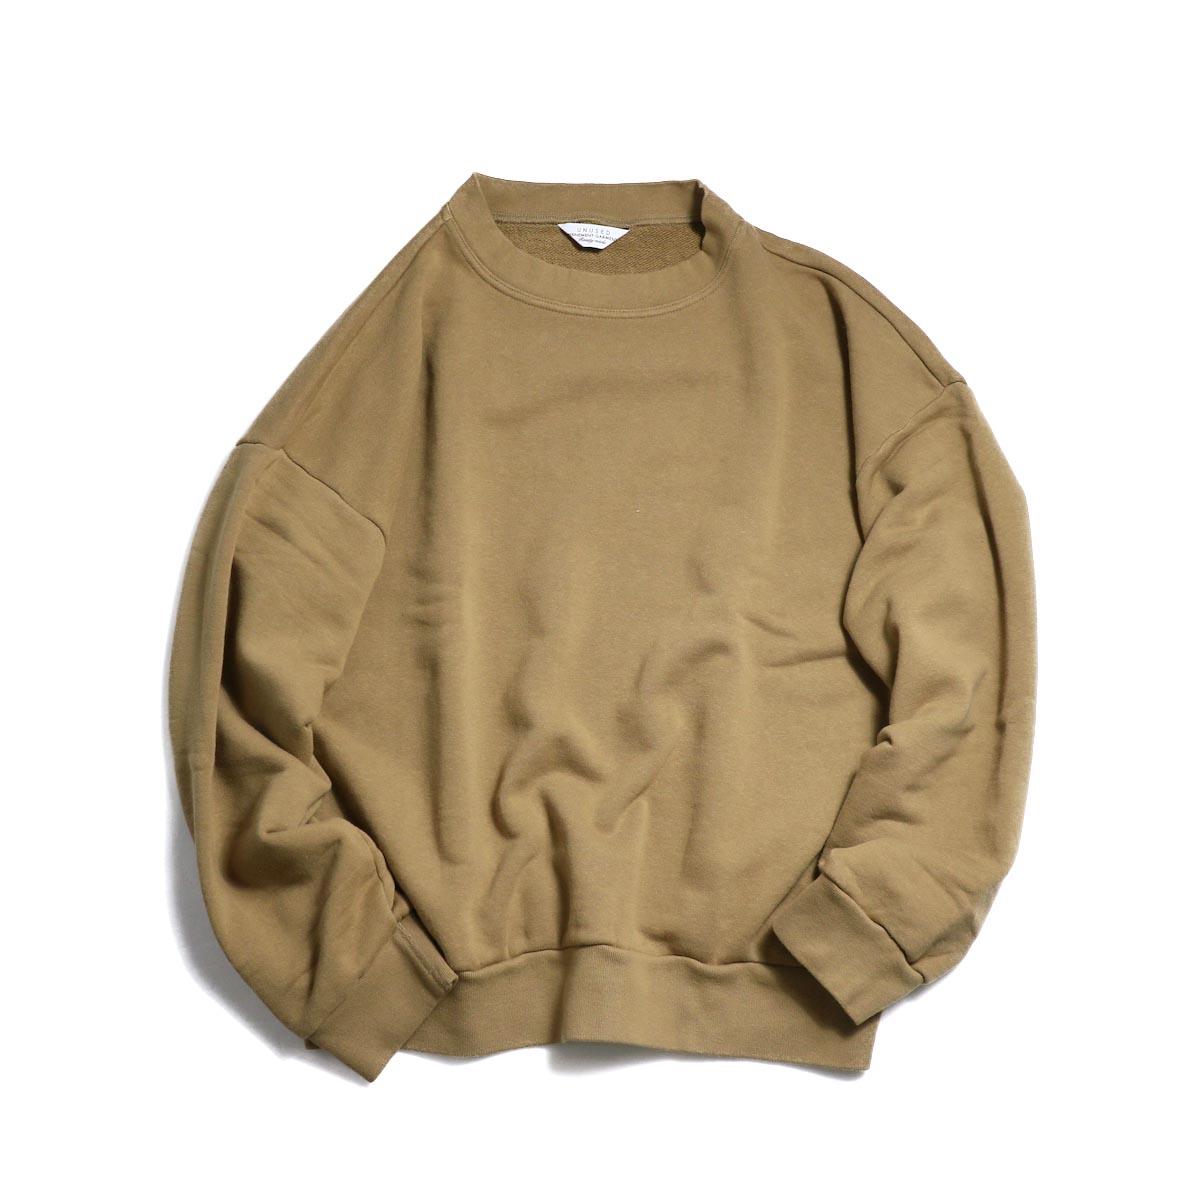 UNUSED / US1529 Crew Neck Sweat Shirt -CAMEL